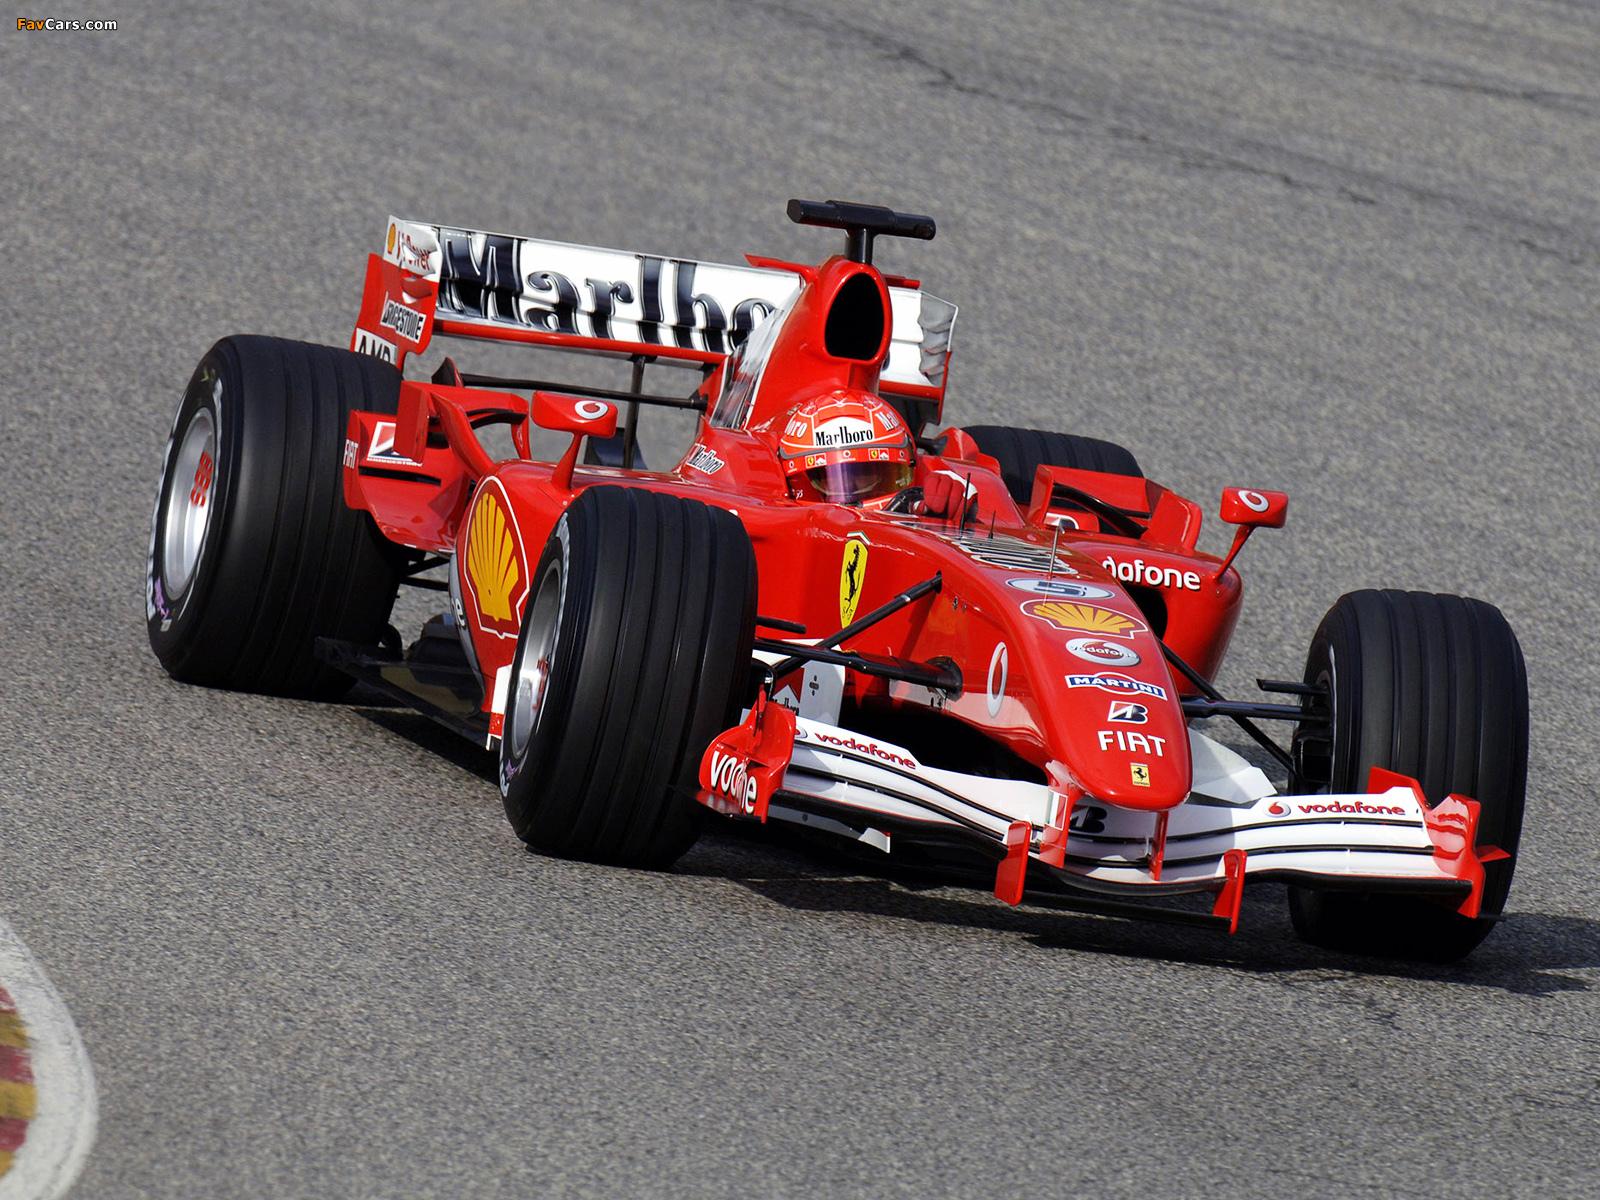 Ferrari 248 F1 2006 Photos (1600x1200